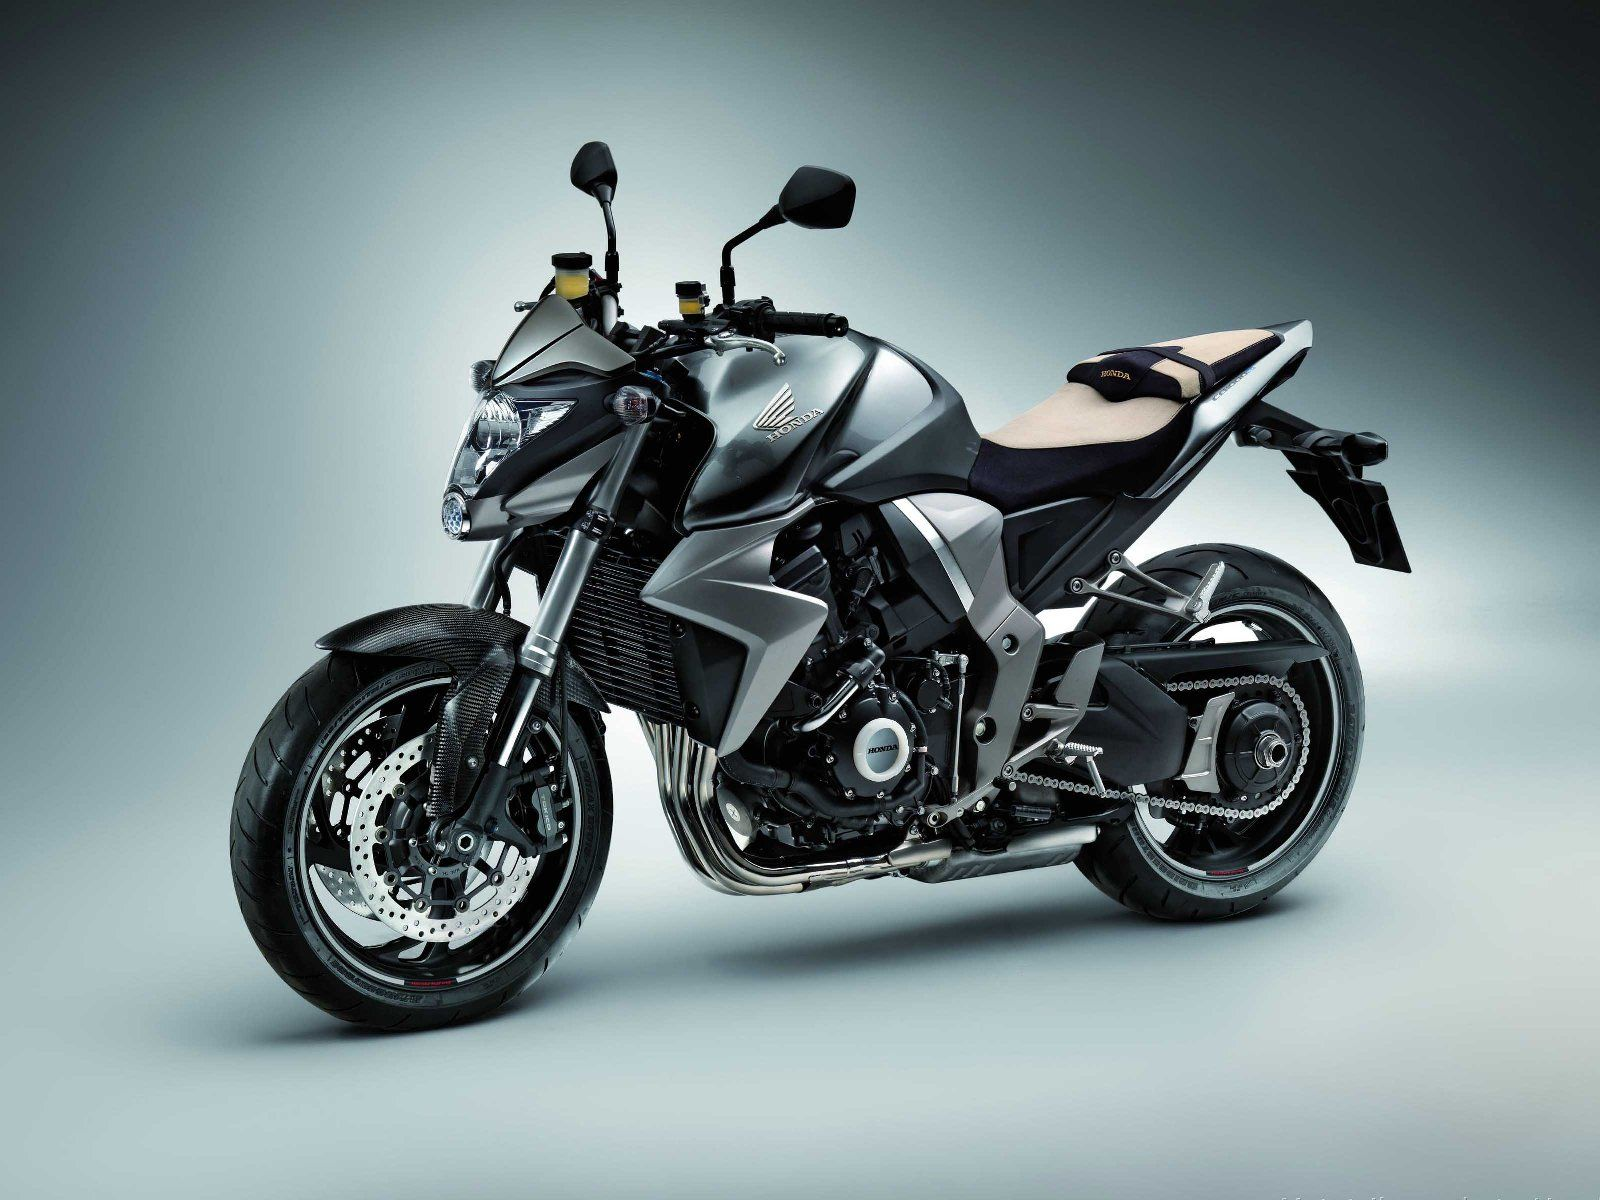 Naked - Honda Motos